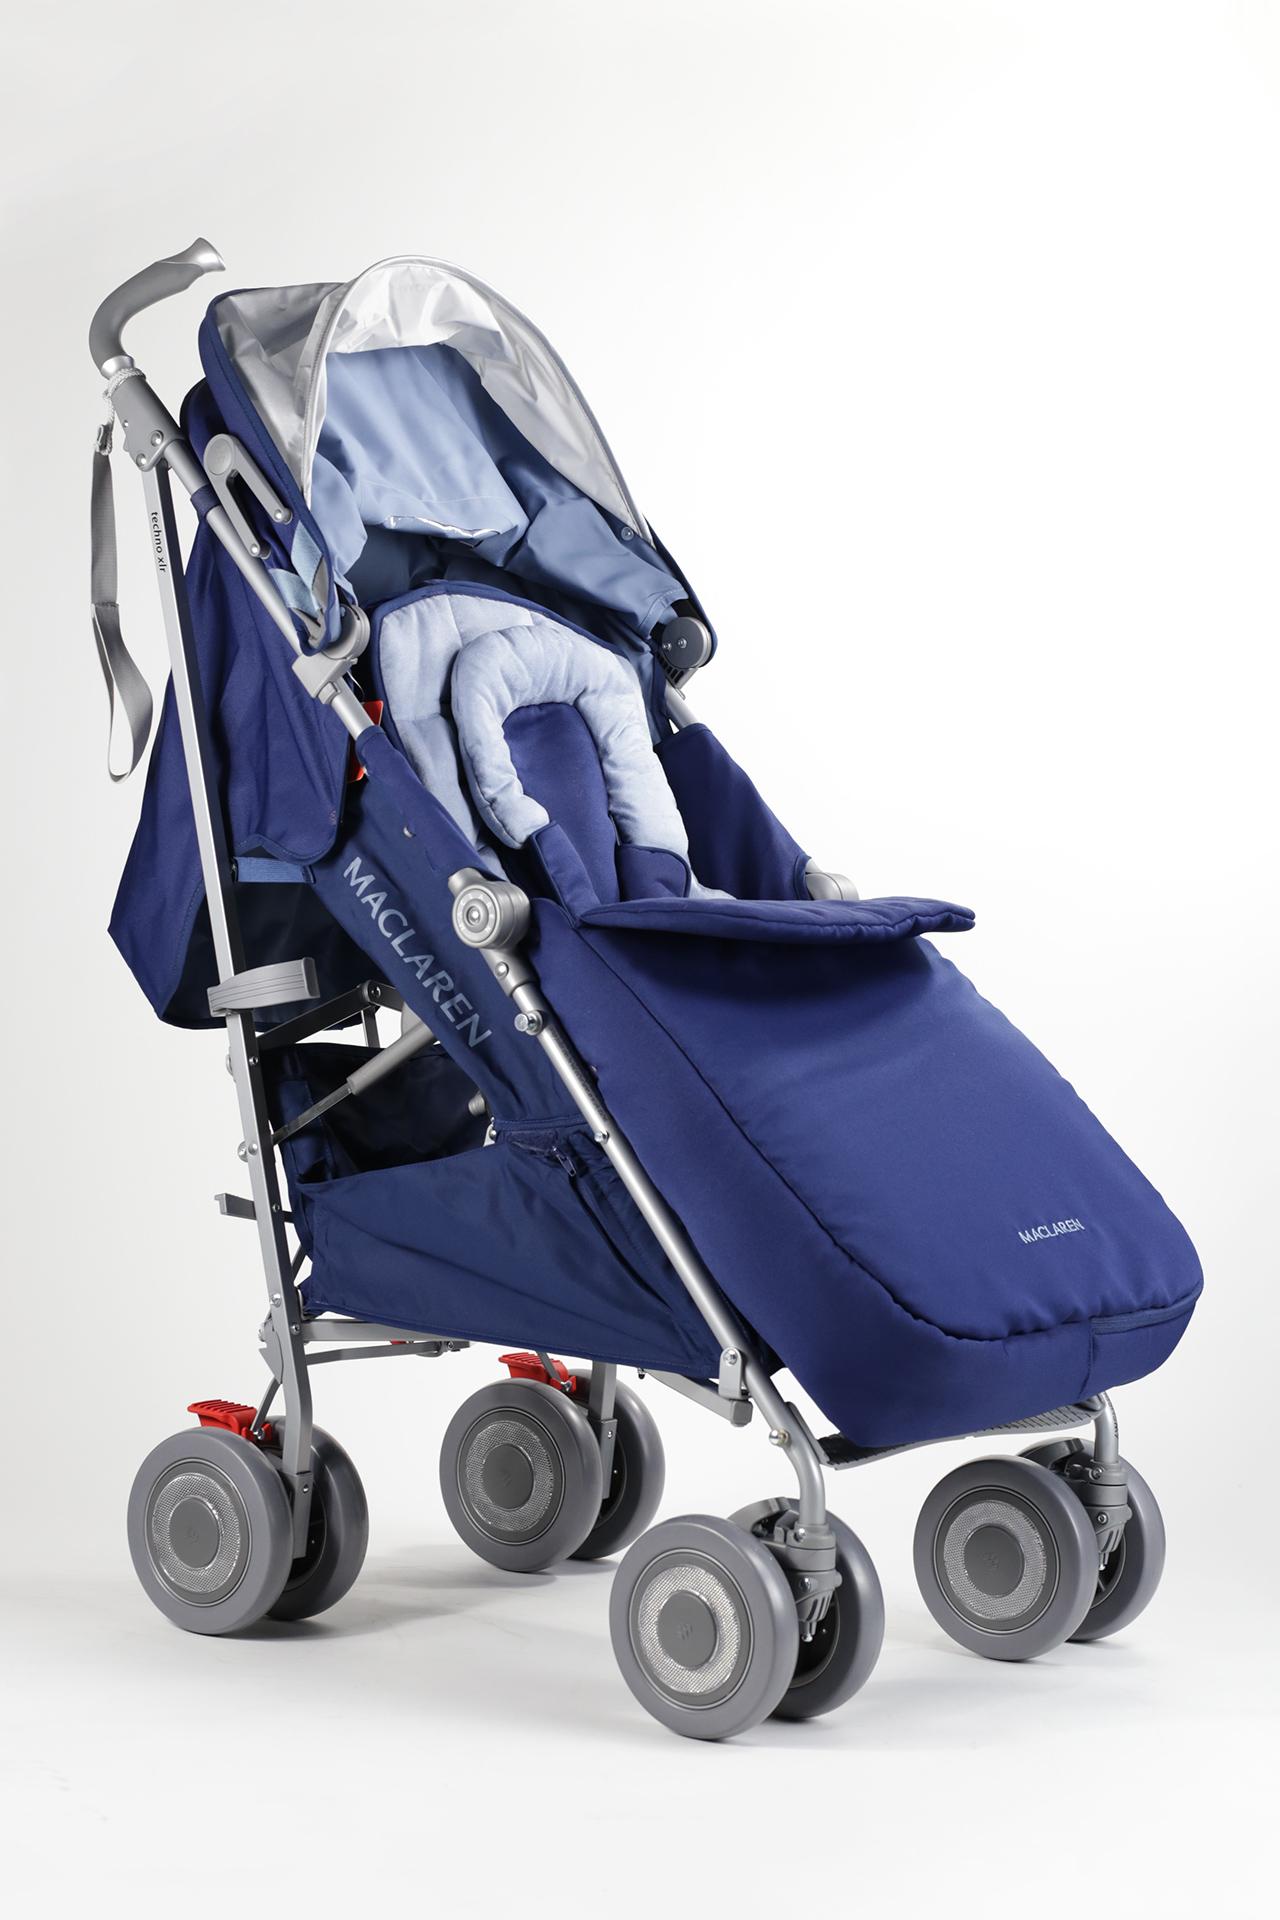 silla de paseo techno xlr maclaren 2016 soft blue